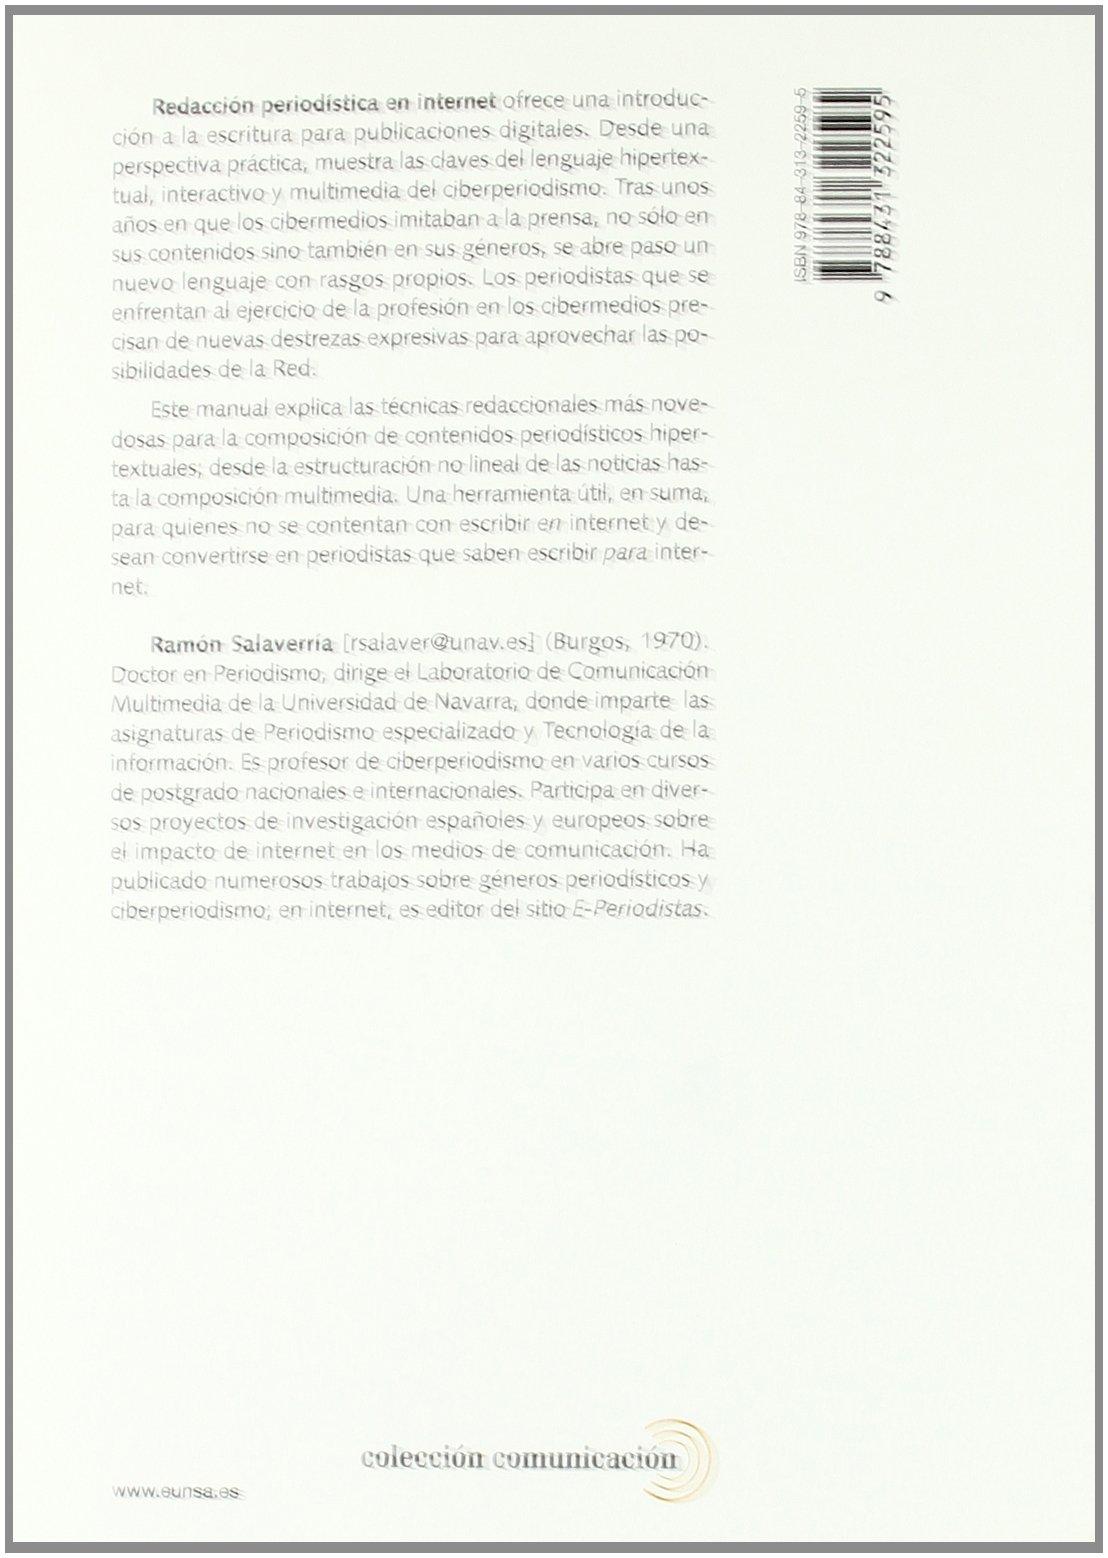 Redaccion Periodistica en Internet: Ramón Salaverría Aliaga ...